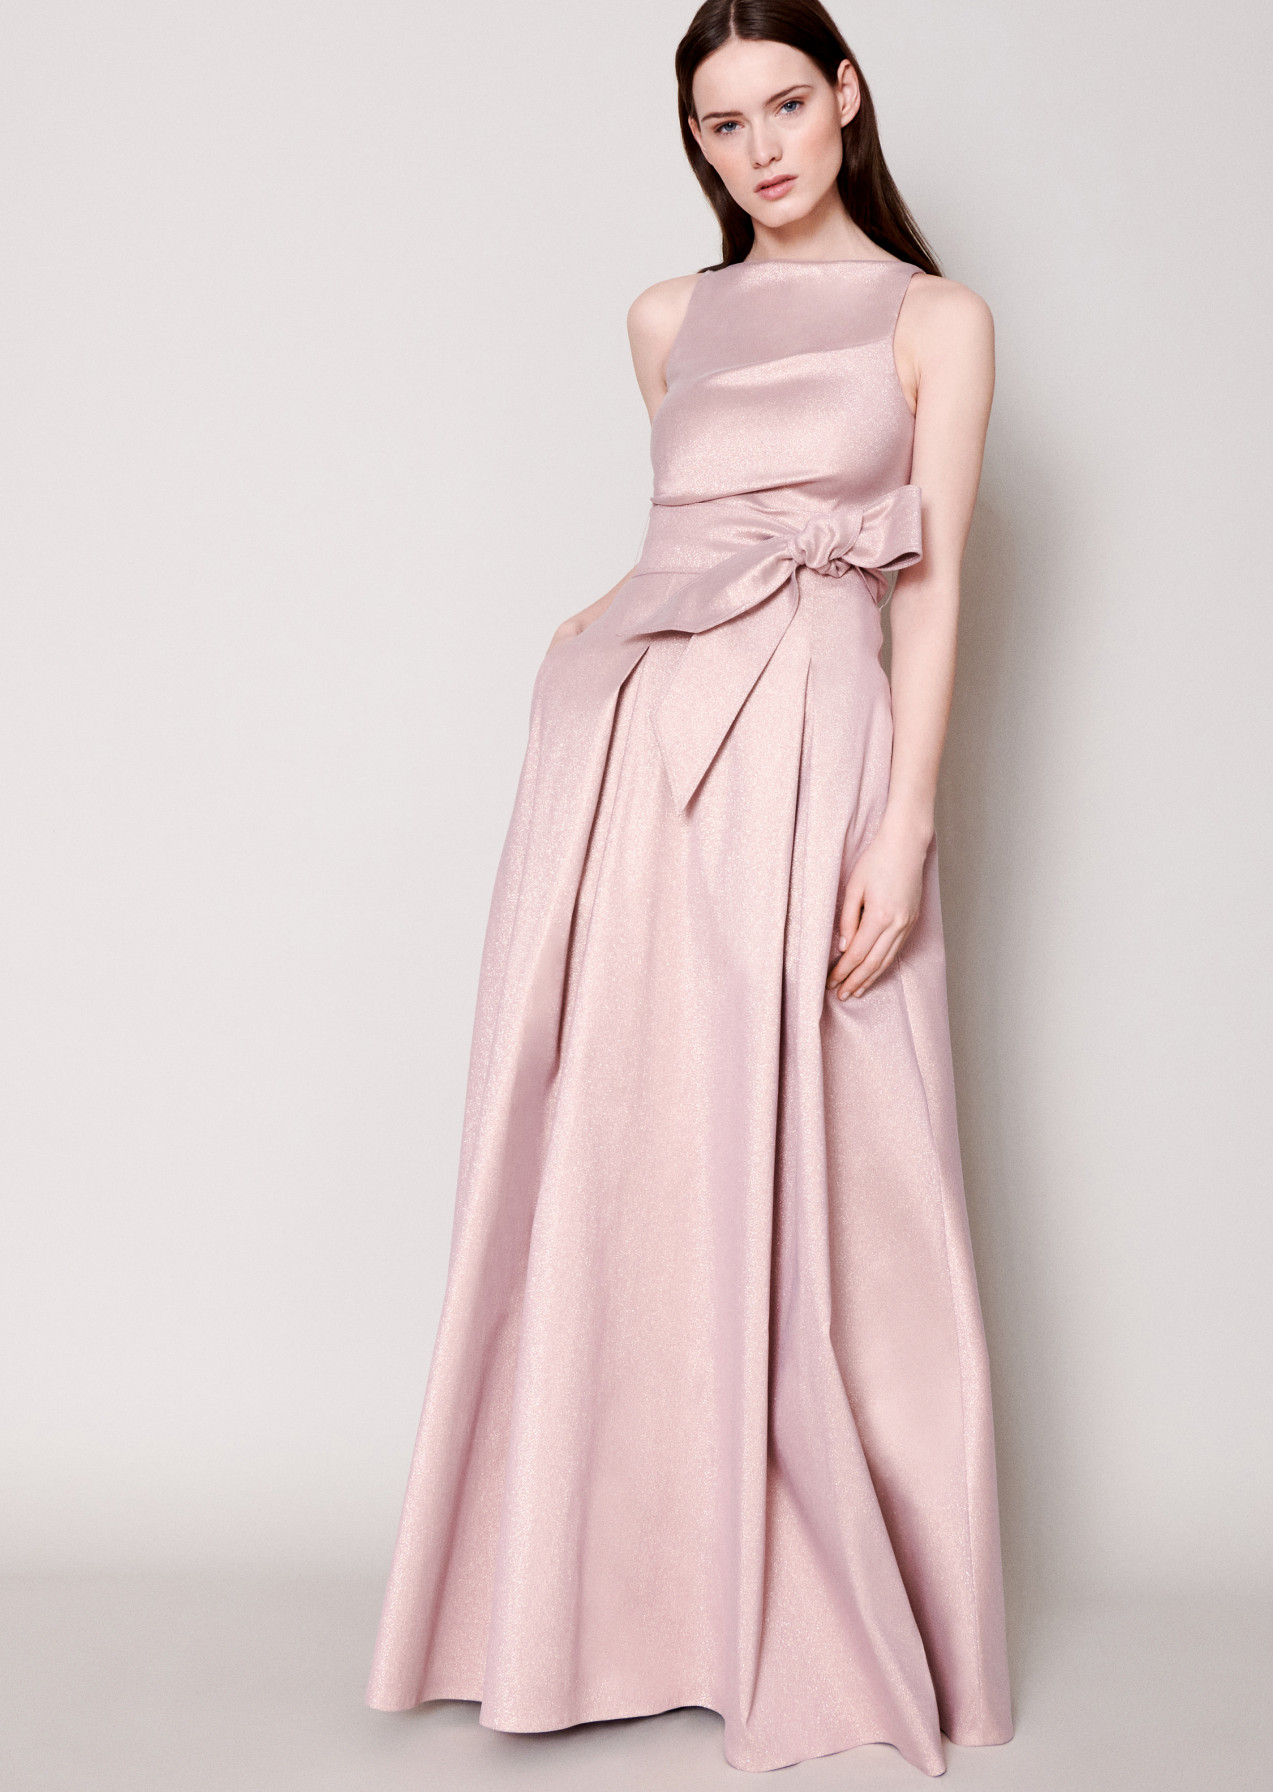 ball gown Bonavita20